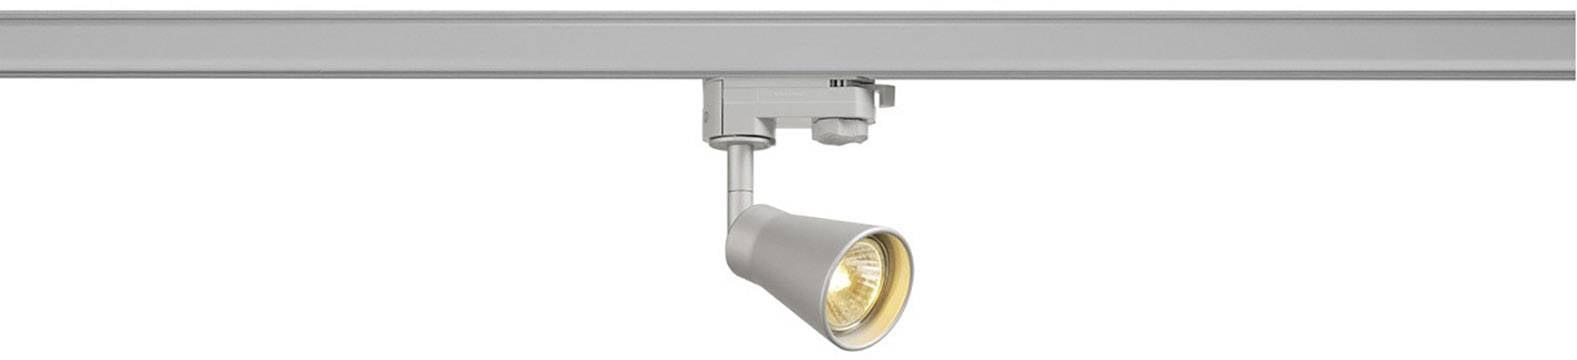 Svítidla do lištových systémů (230 V) GU10 SLV 152644 stříbrná